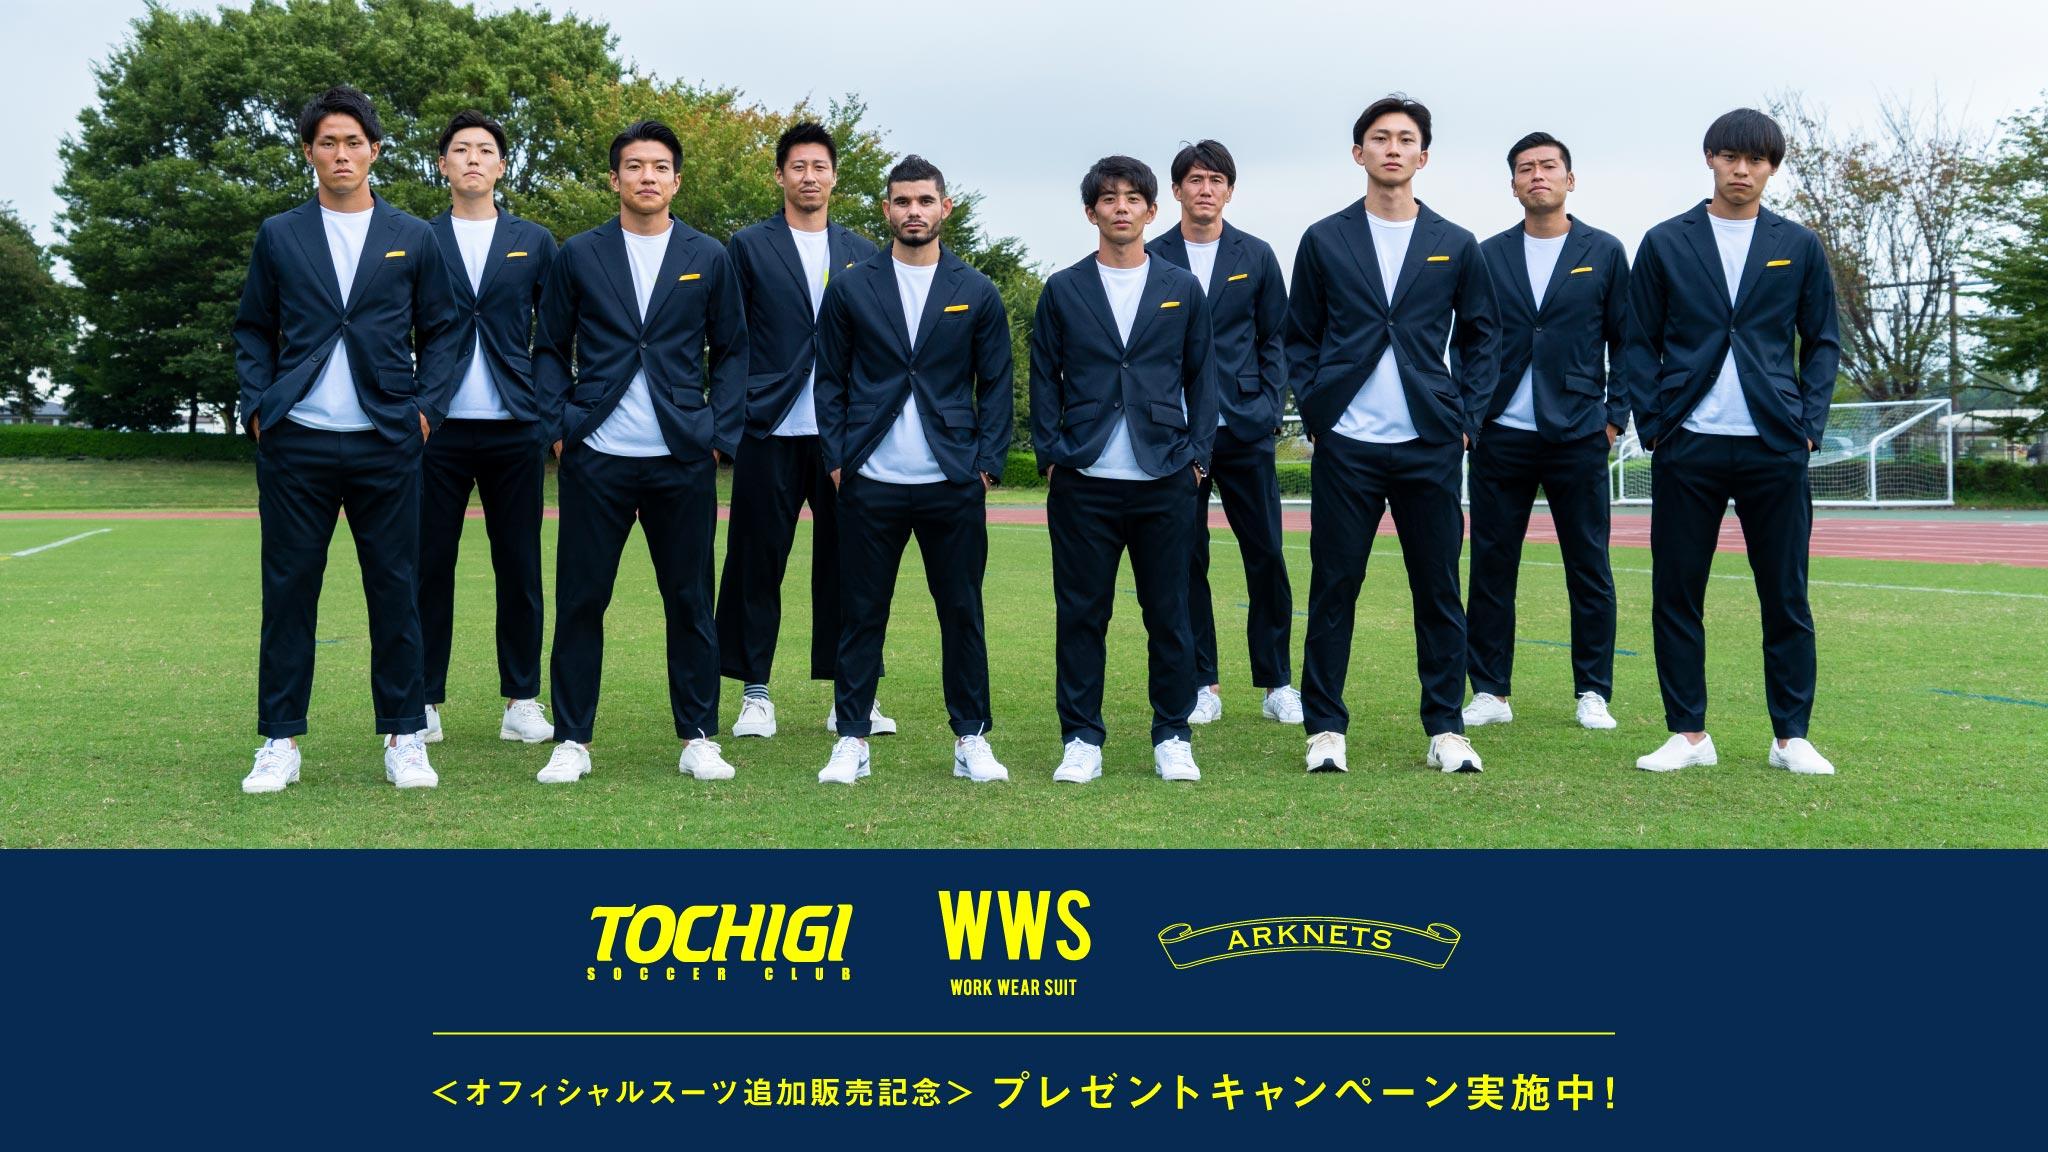 「WWS×TOCHIGI SC×ARKnets」栃木SCオフィシャルスーツ追加販売を記念してプレゼントキャンペーンを実施中!